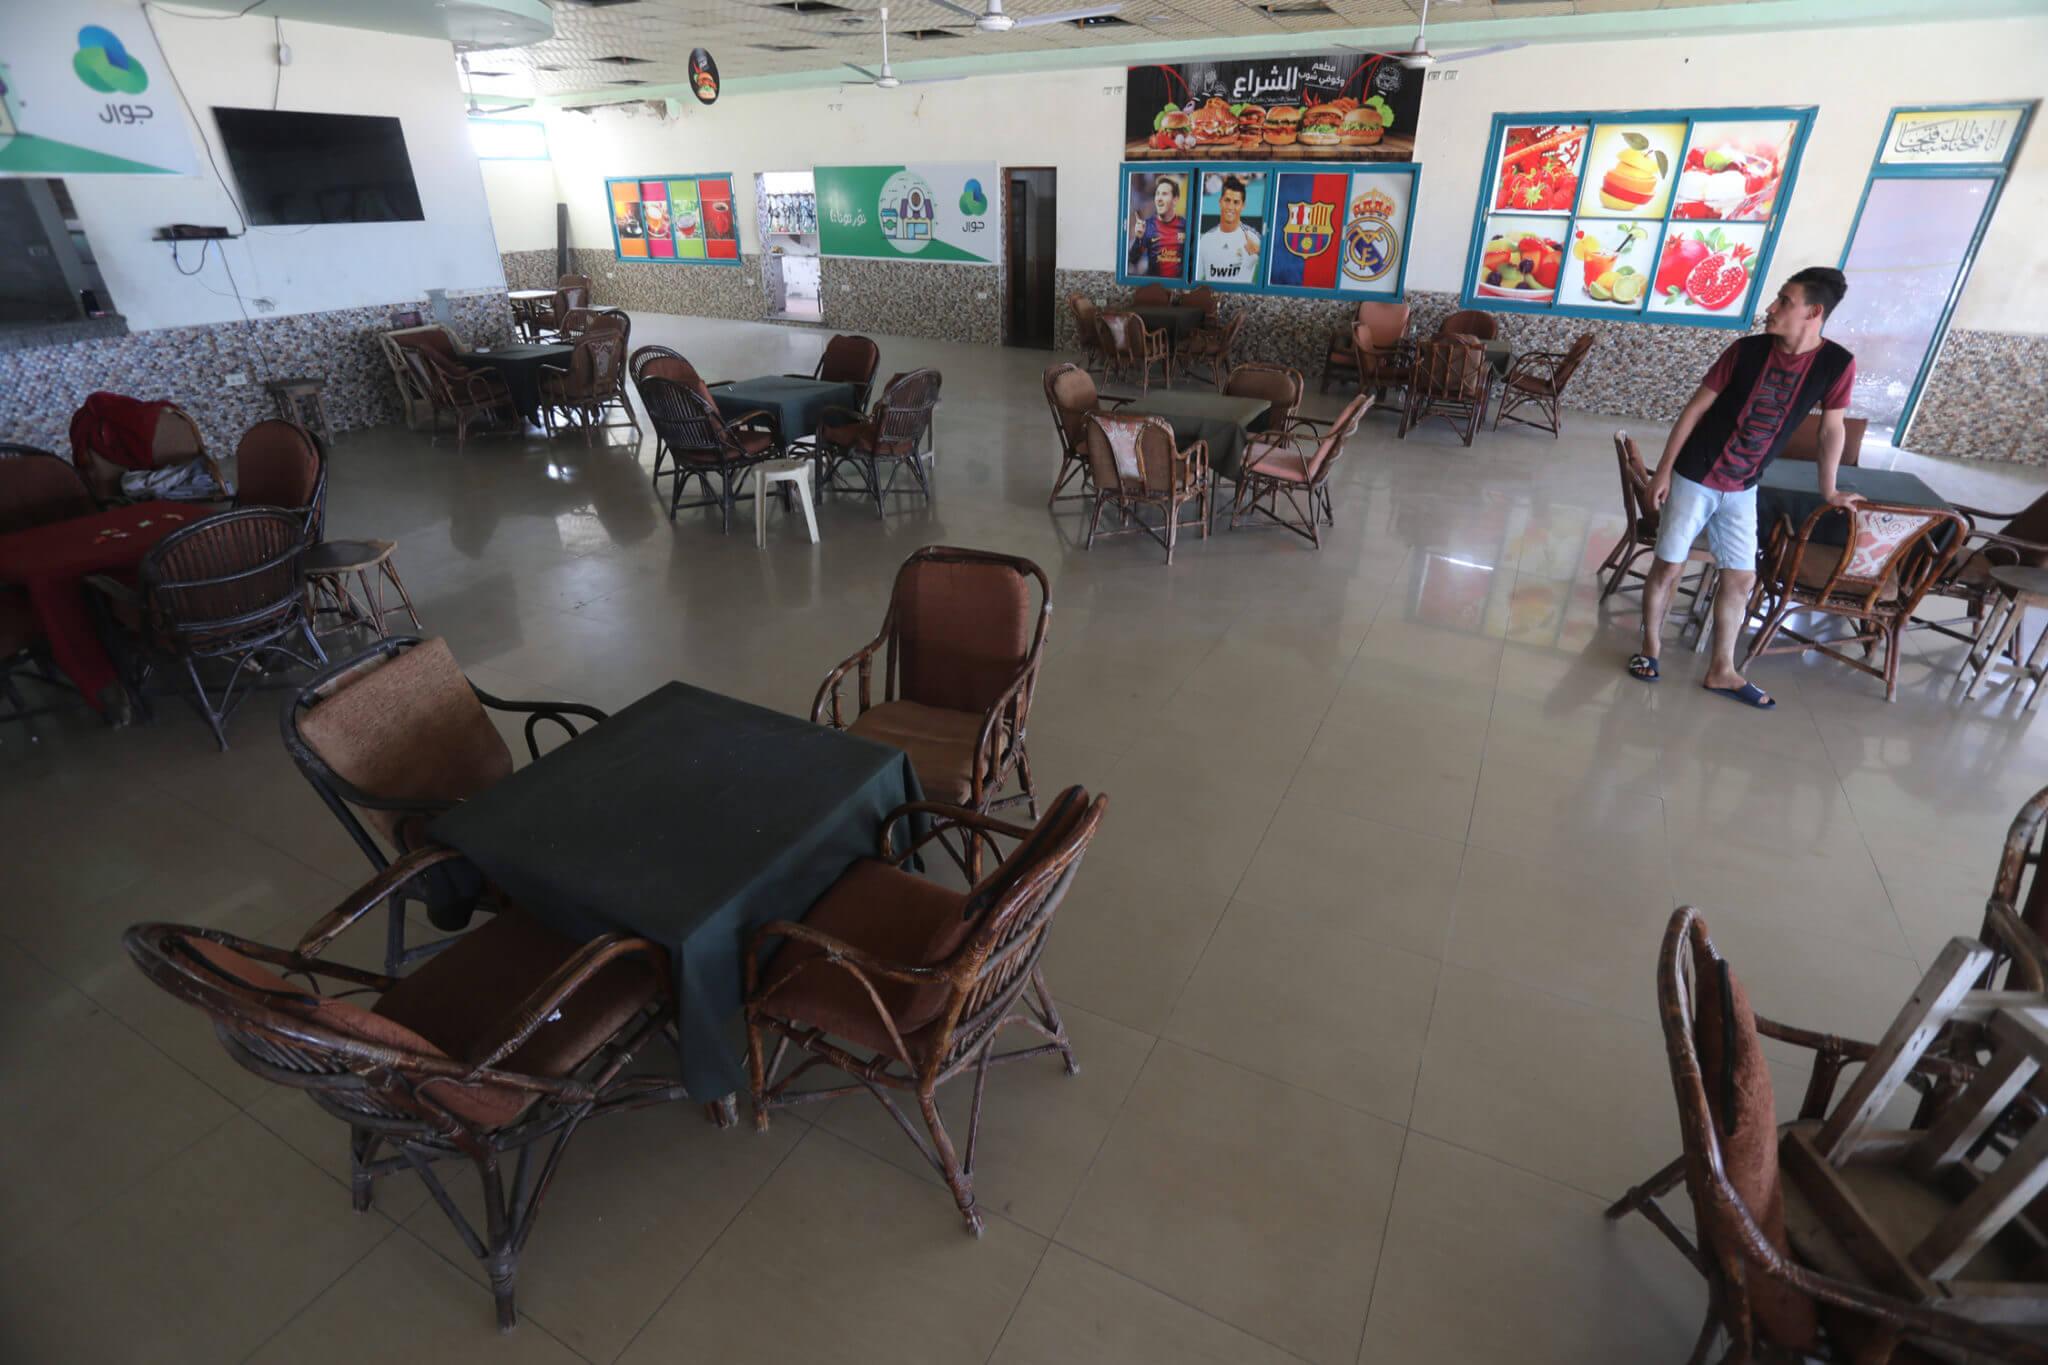 An empty coffee shop